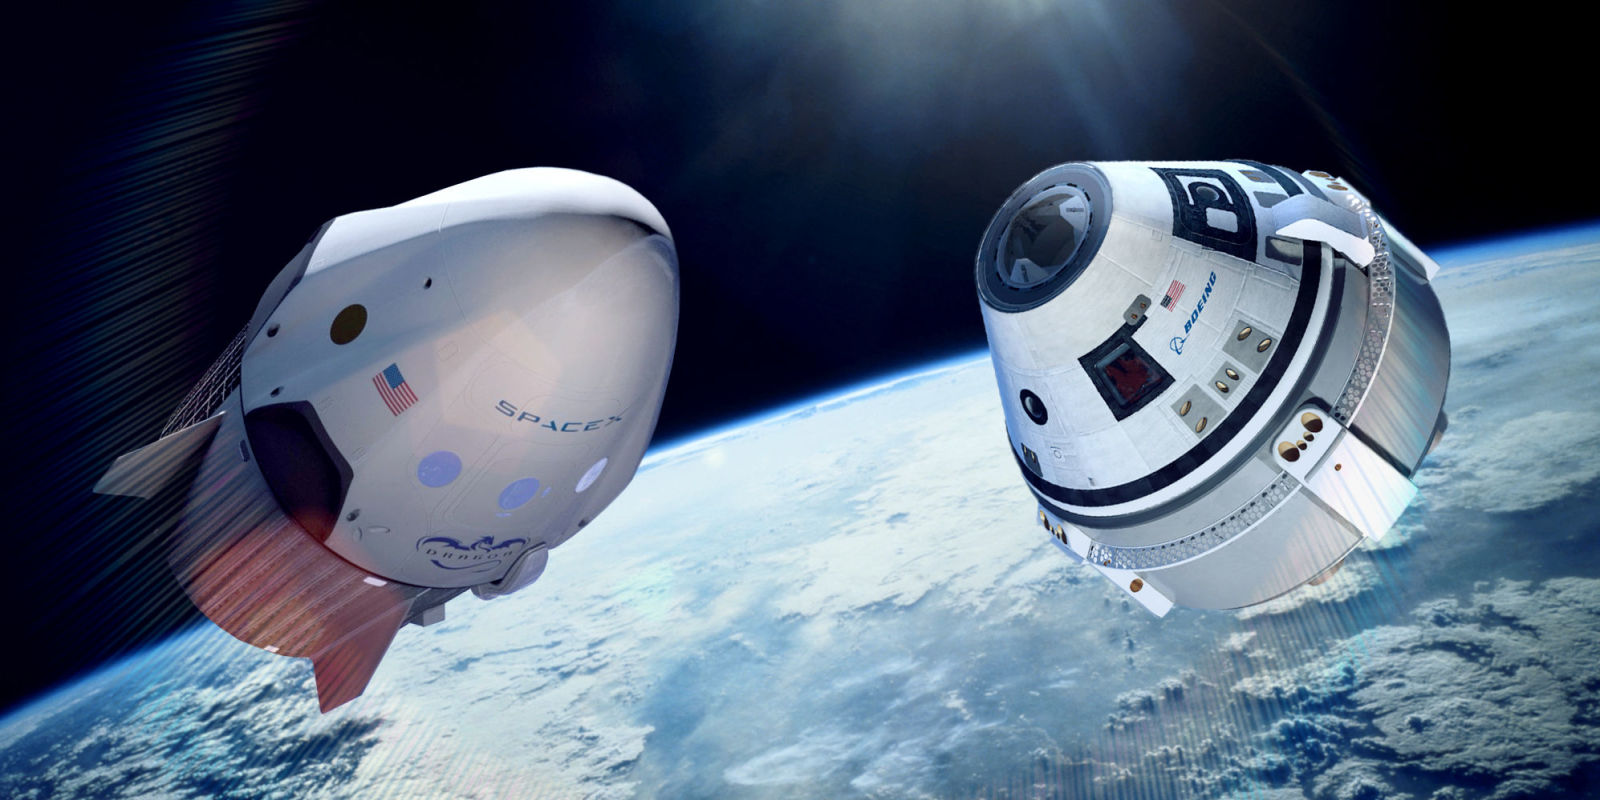 spacecraft crew - photo #40